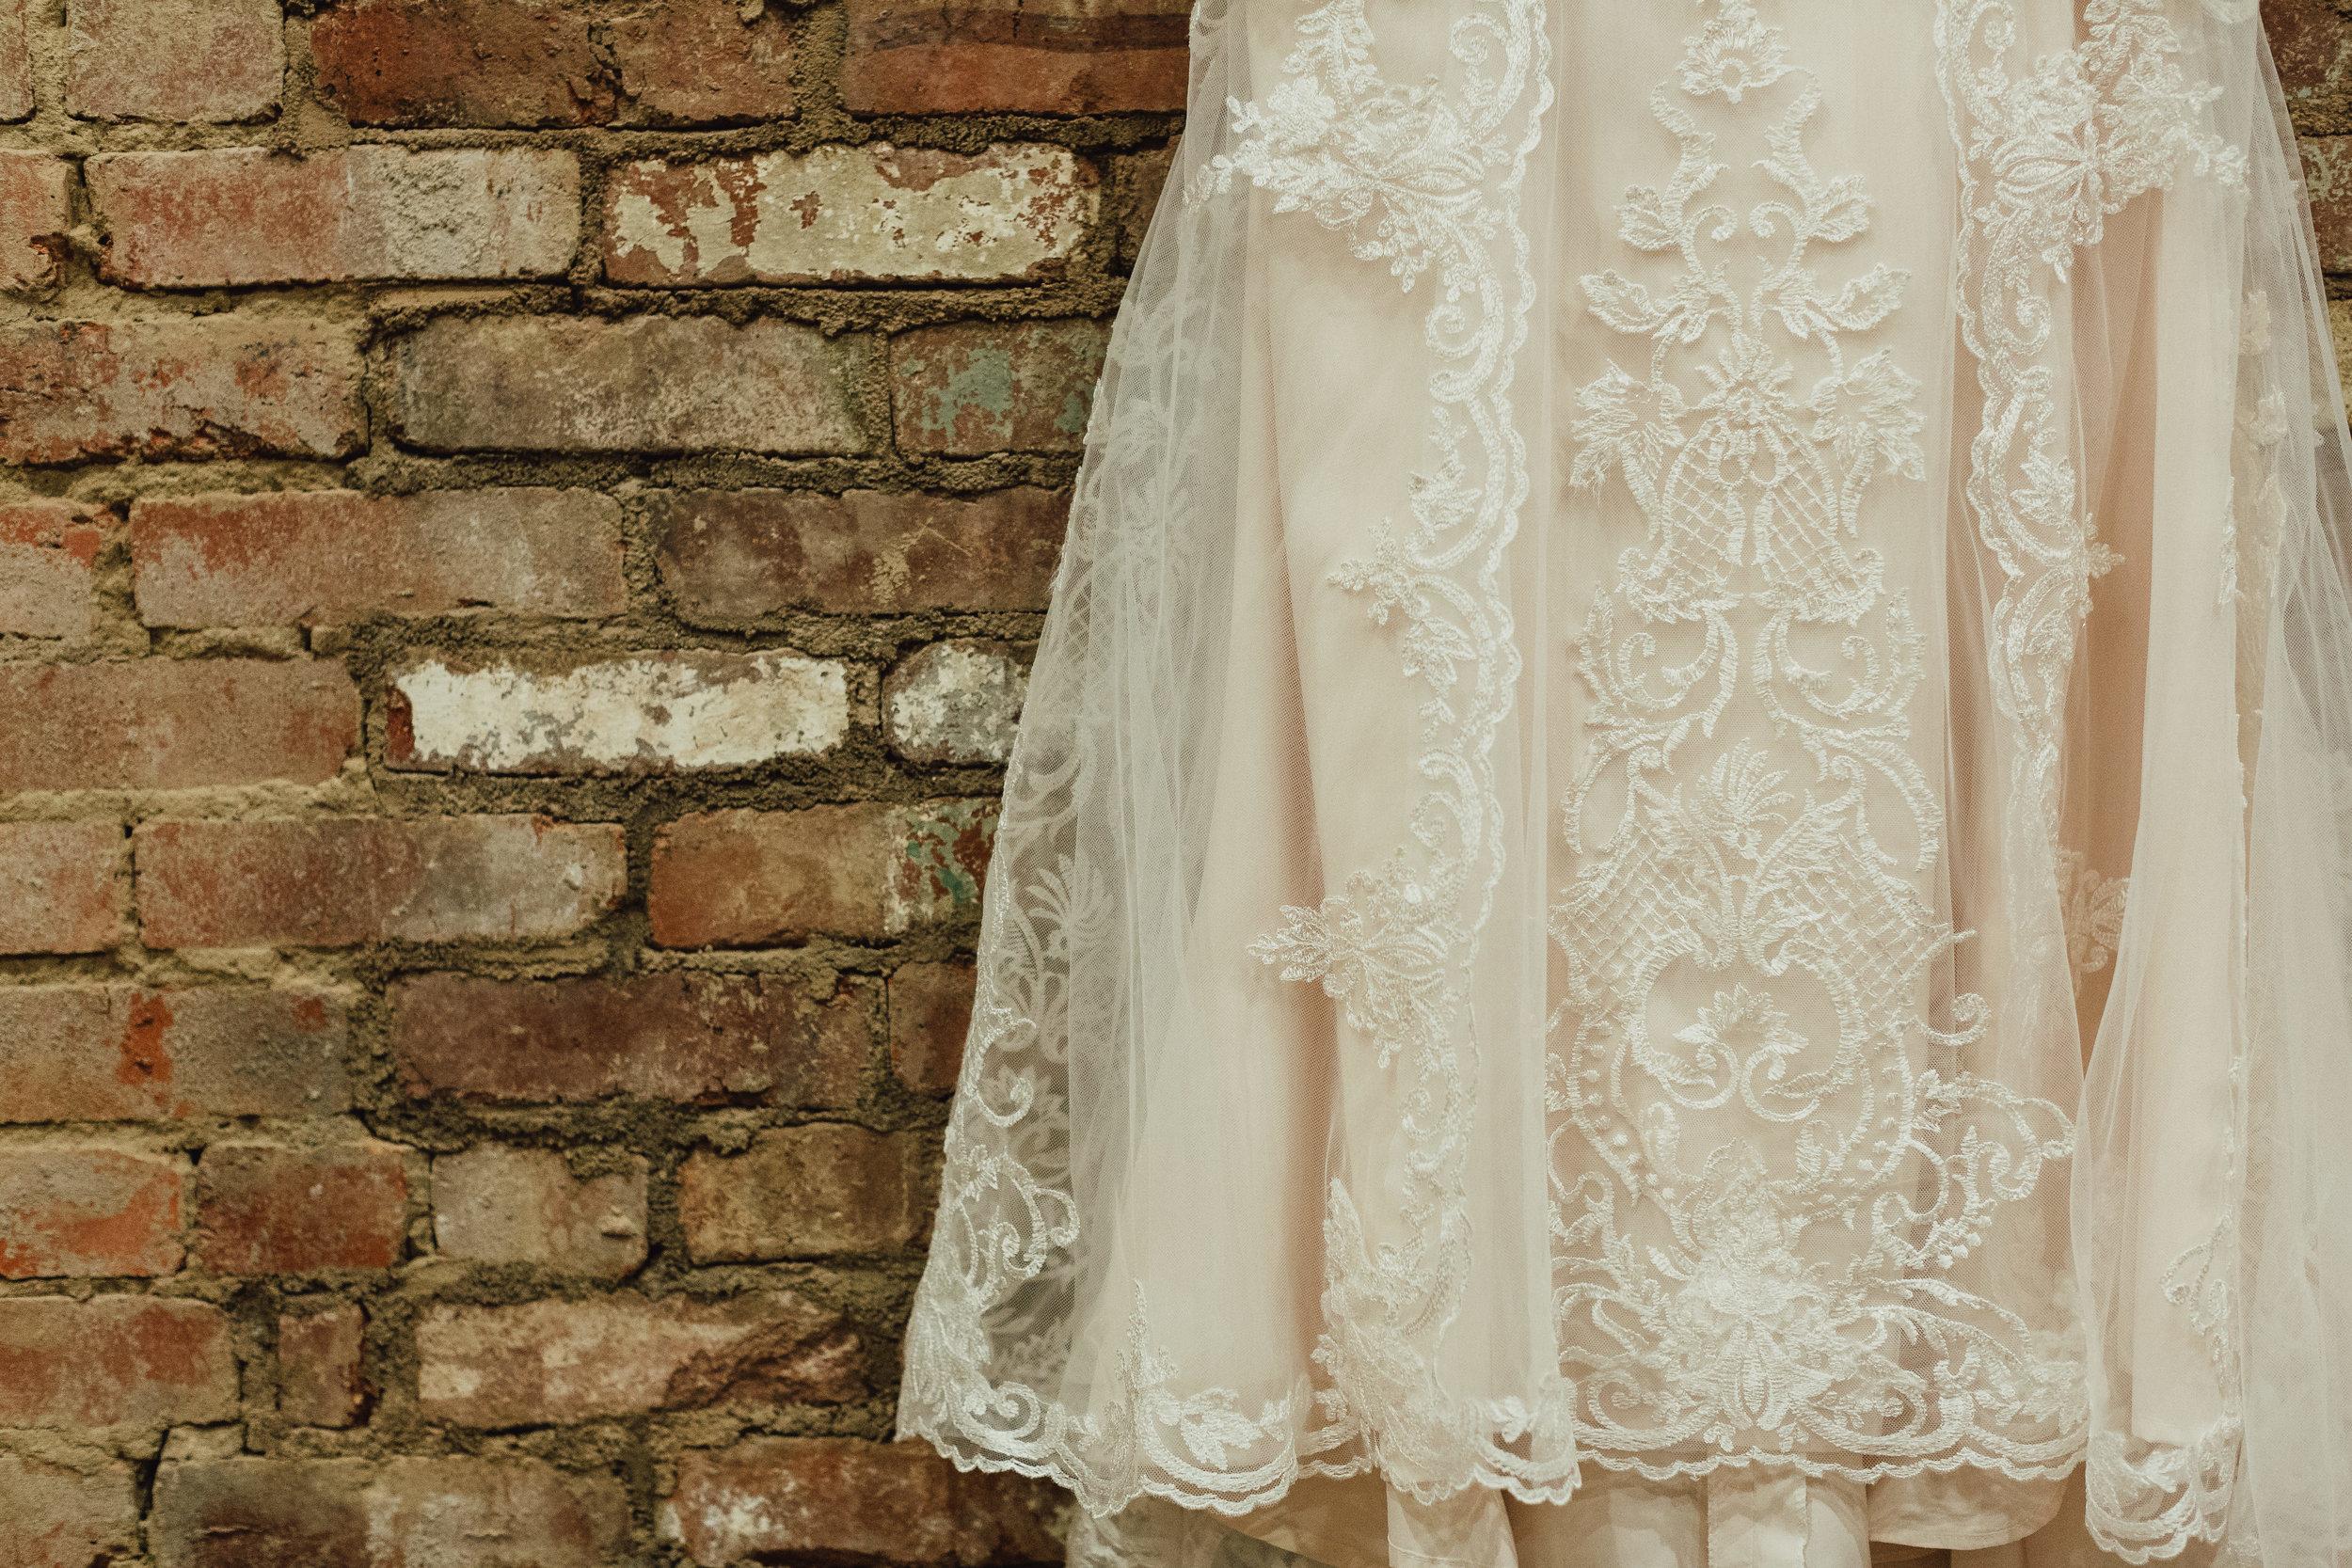 east-tn-wedding-photographer-tennessee-elopement-photographer-kingsport-tn-wedding-photographer (102 of 1001).jpg